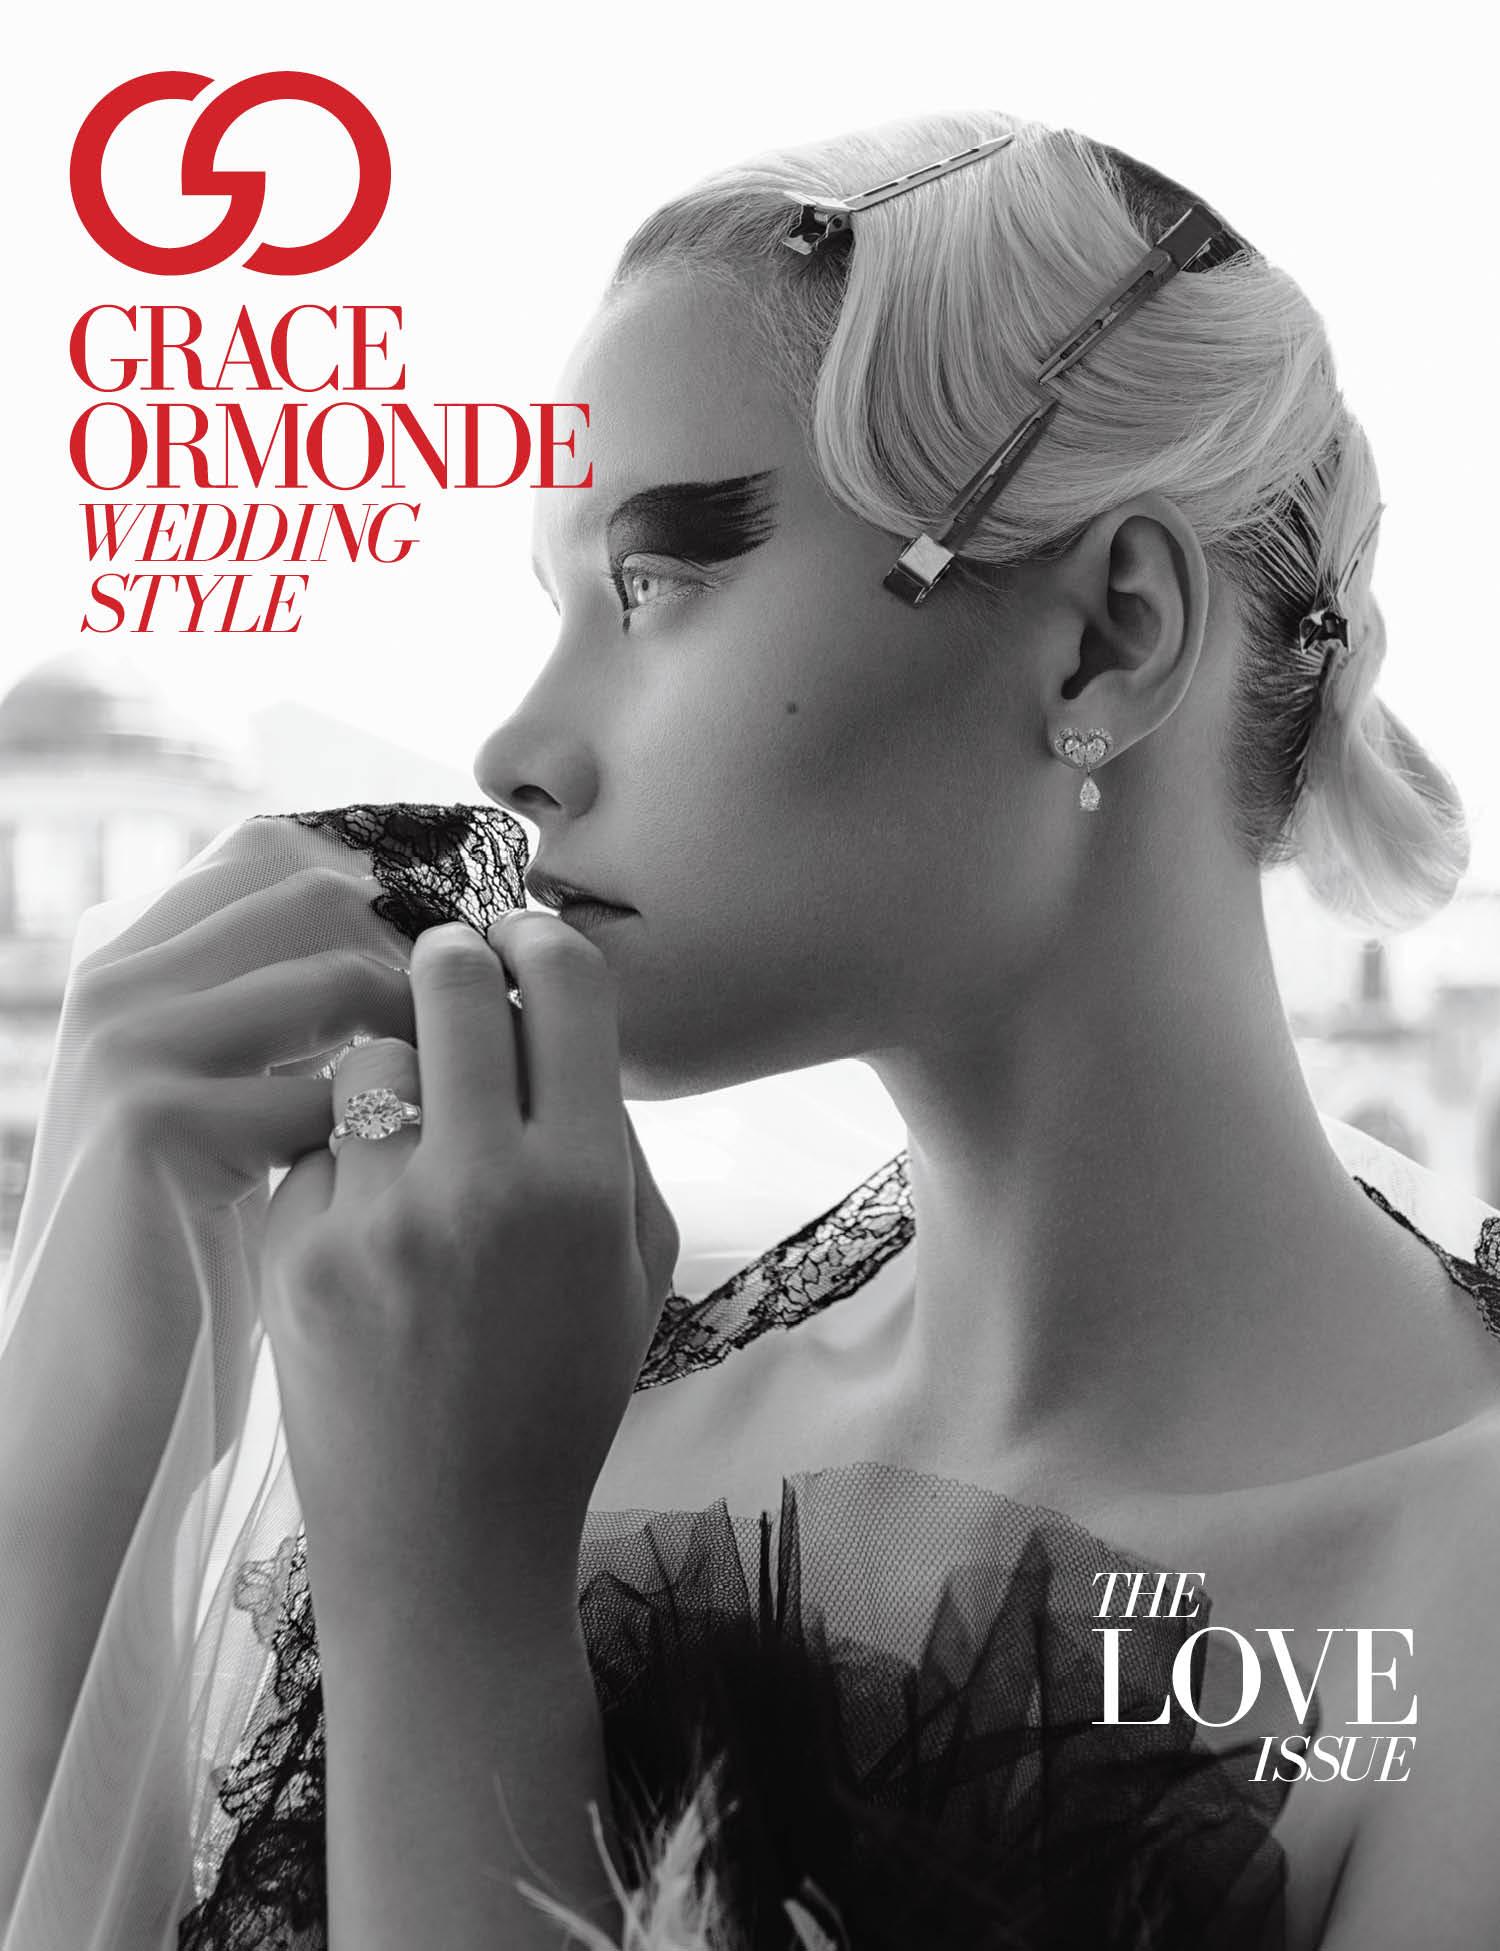 Grace Ormonde Wedding Style 2018